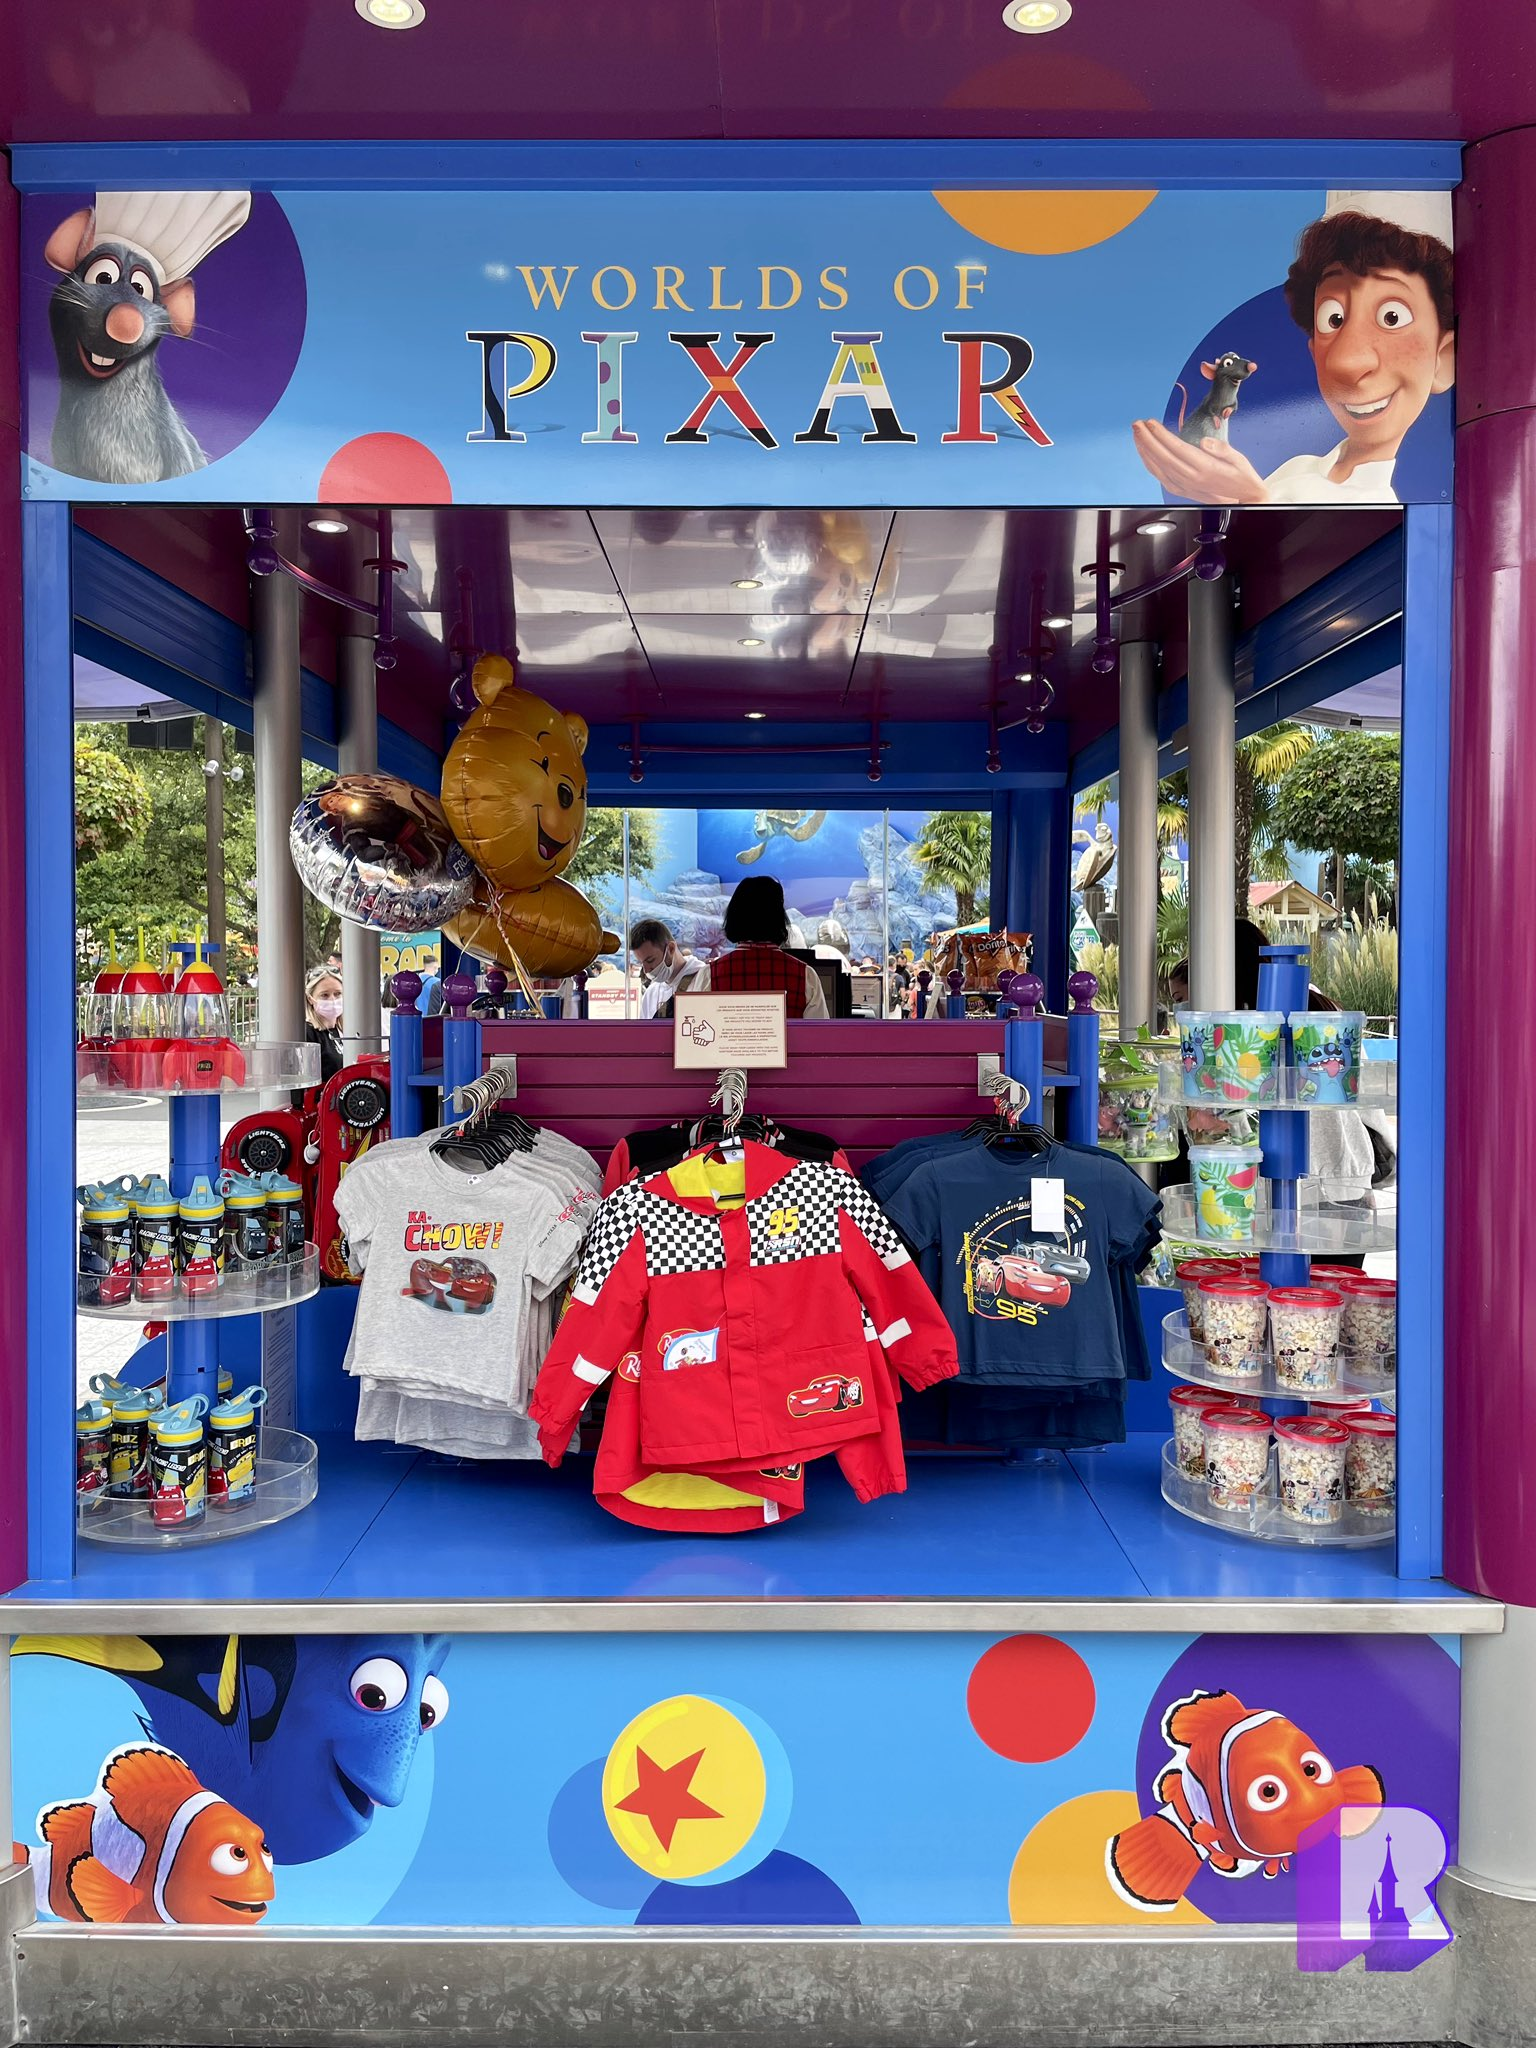 2021 - World of Pixar E9zkgs10